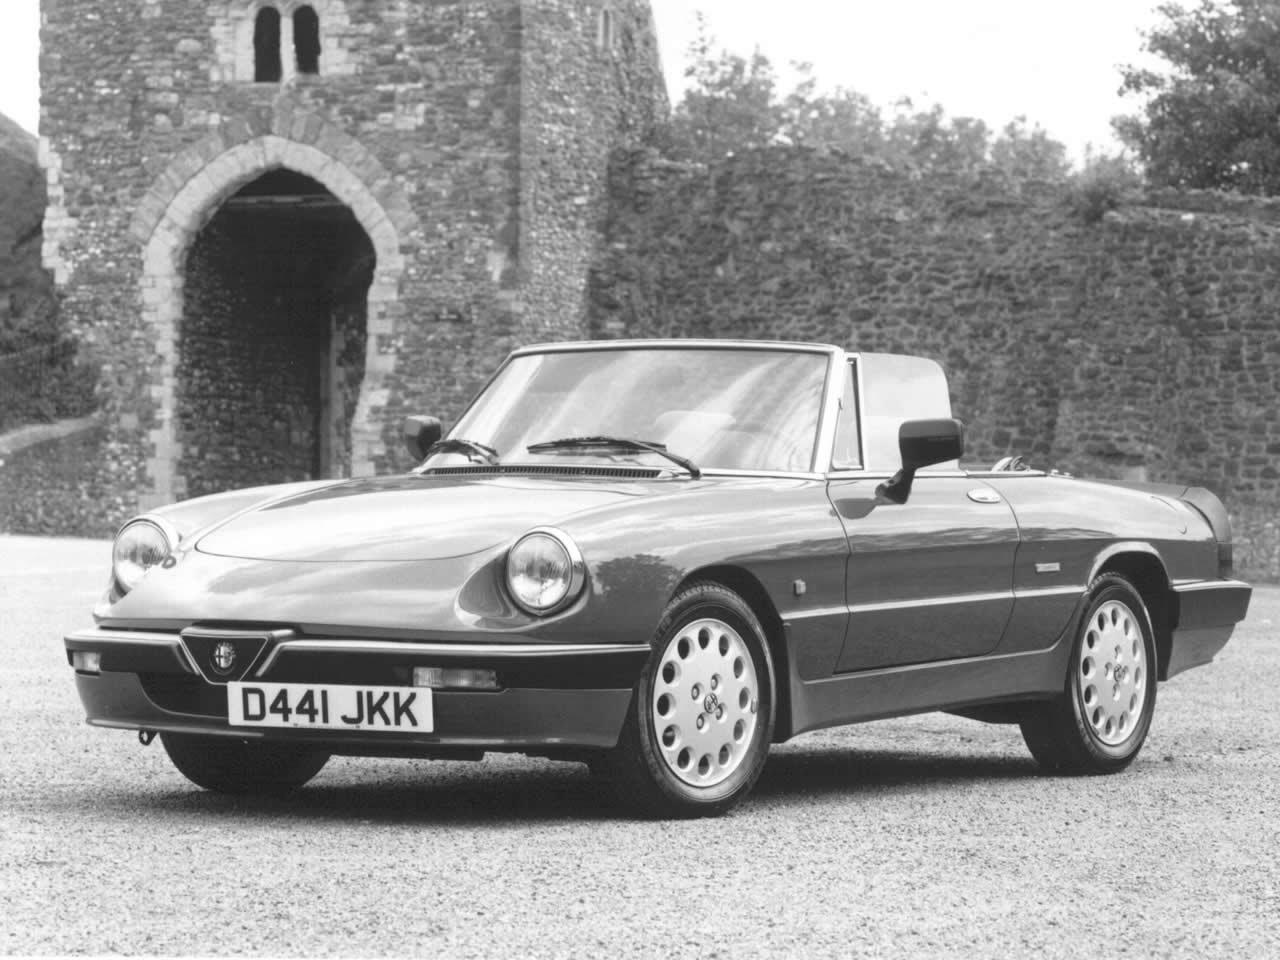 Classic Alfa Romeo Spider Buying Guide